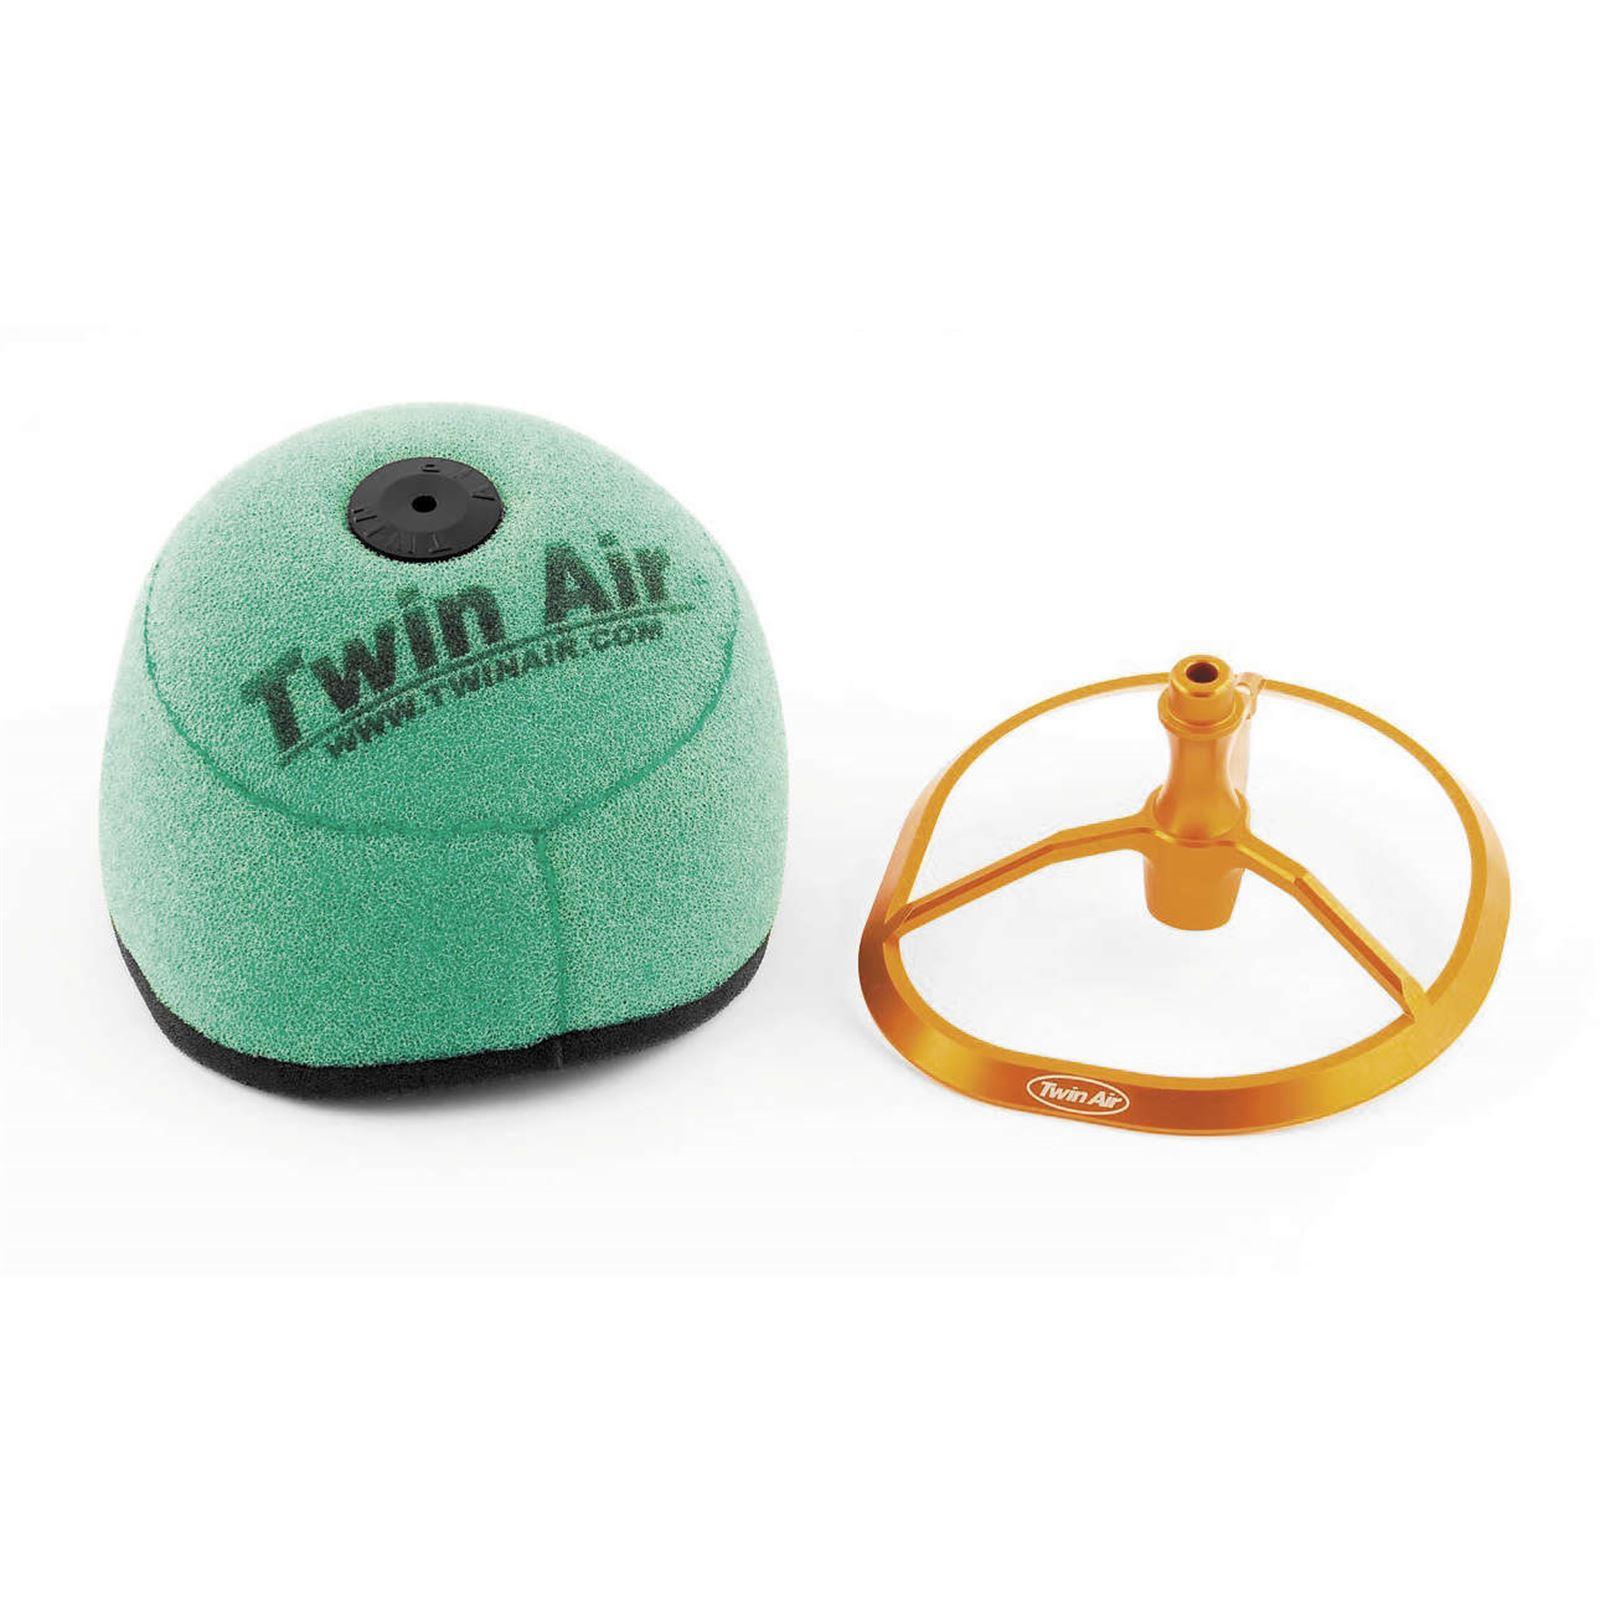 Twin Air Power Flow Air Filter Kit